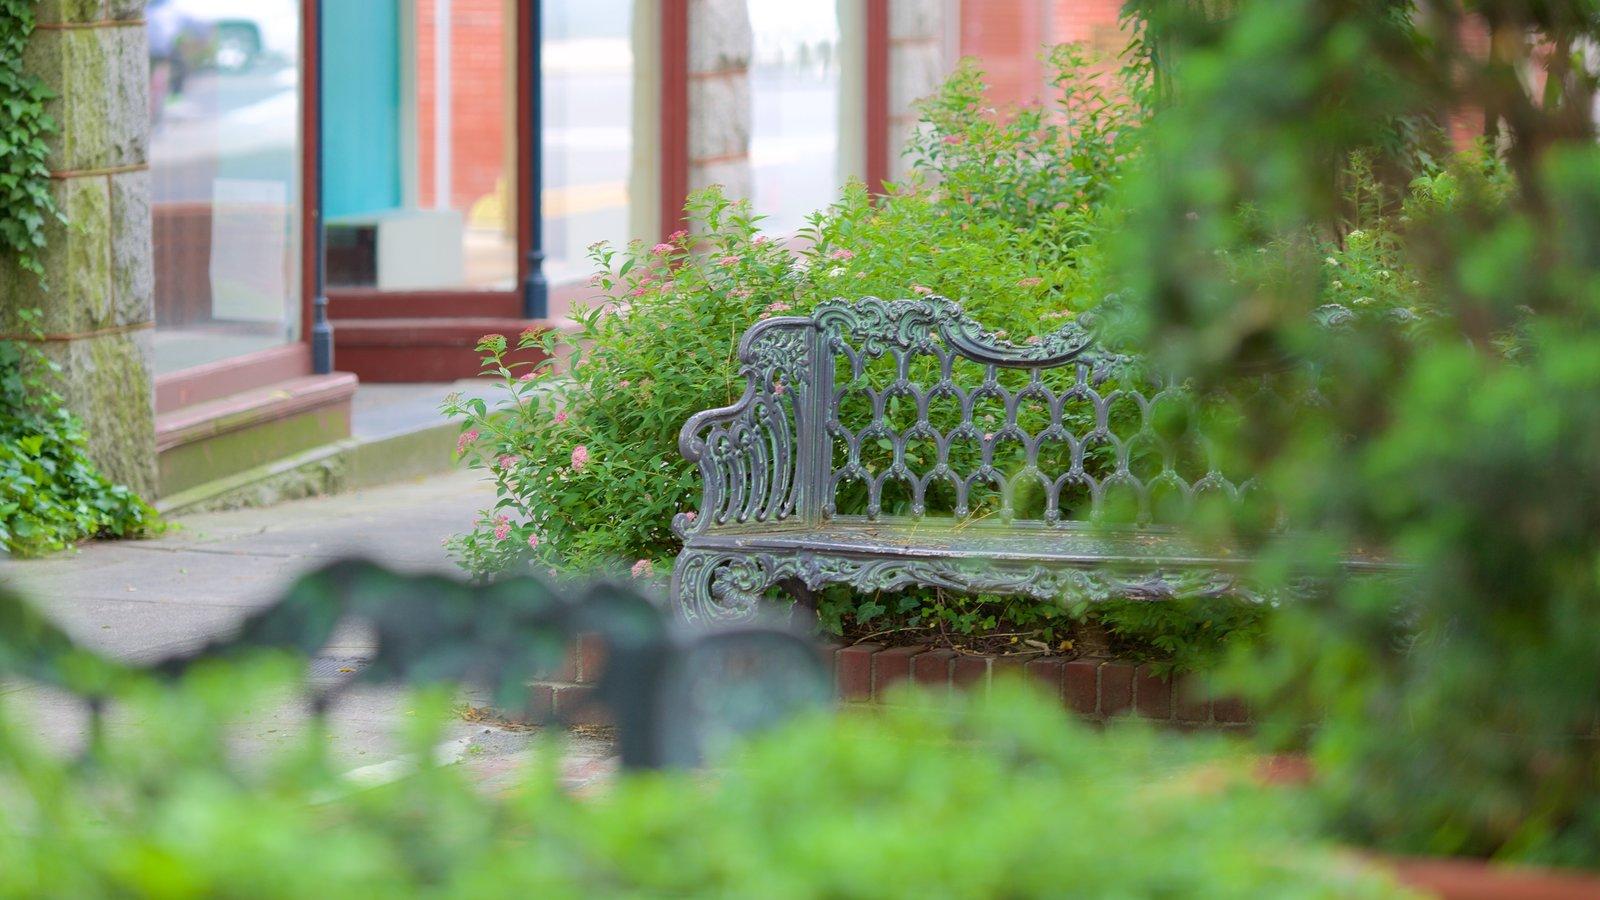 Salisbury featuring a park